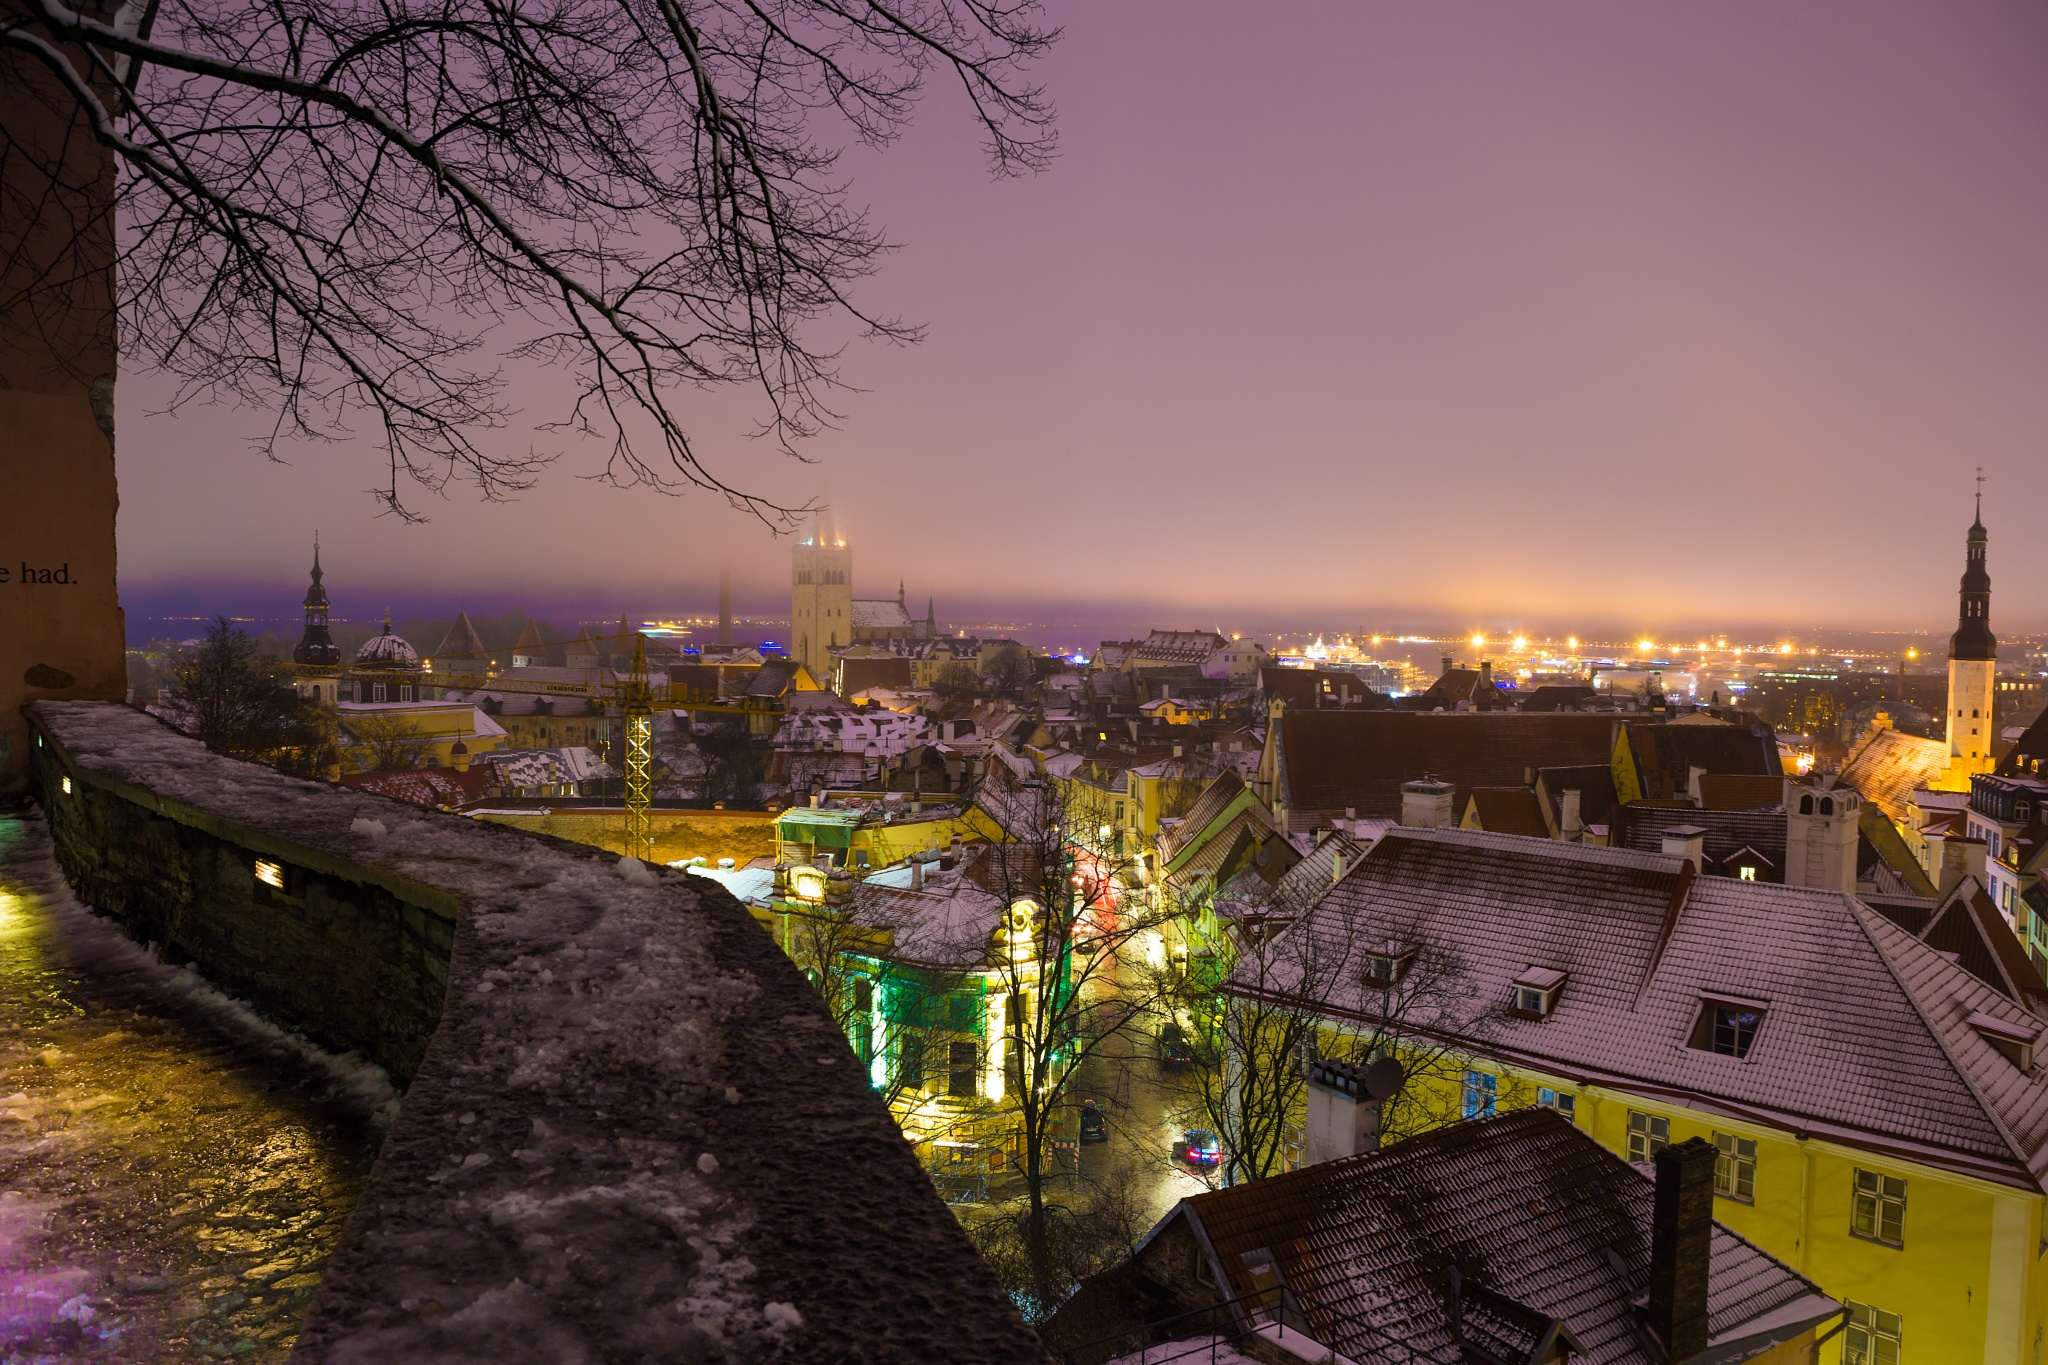 One night in Tallinn by antonburkhan